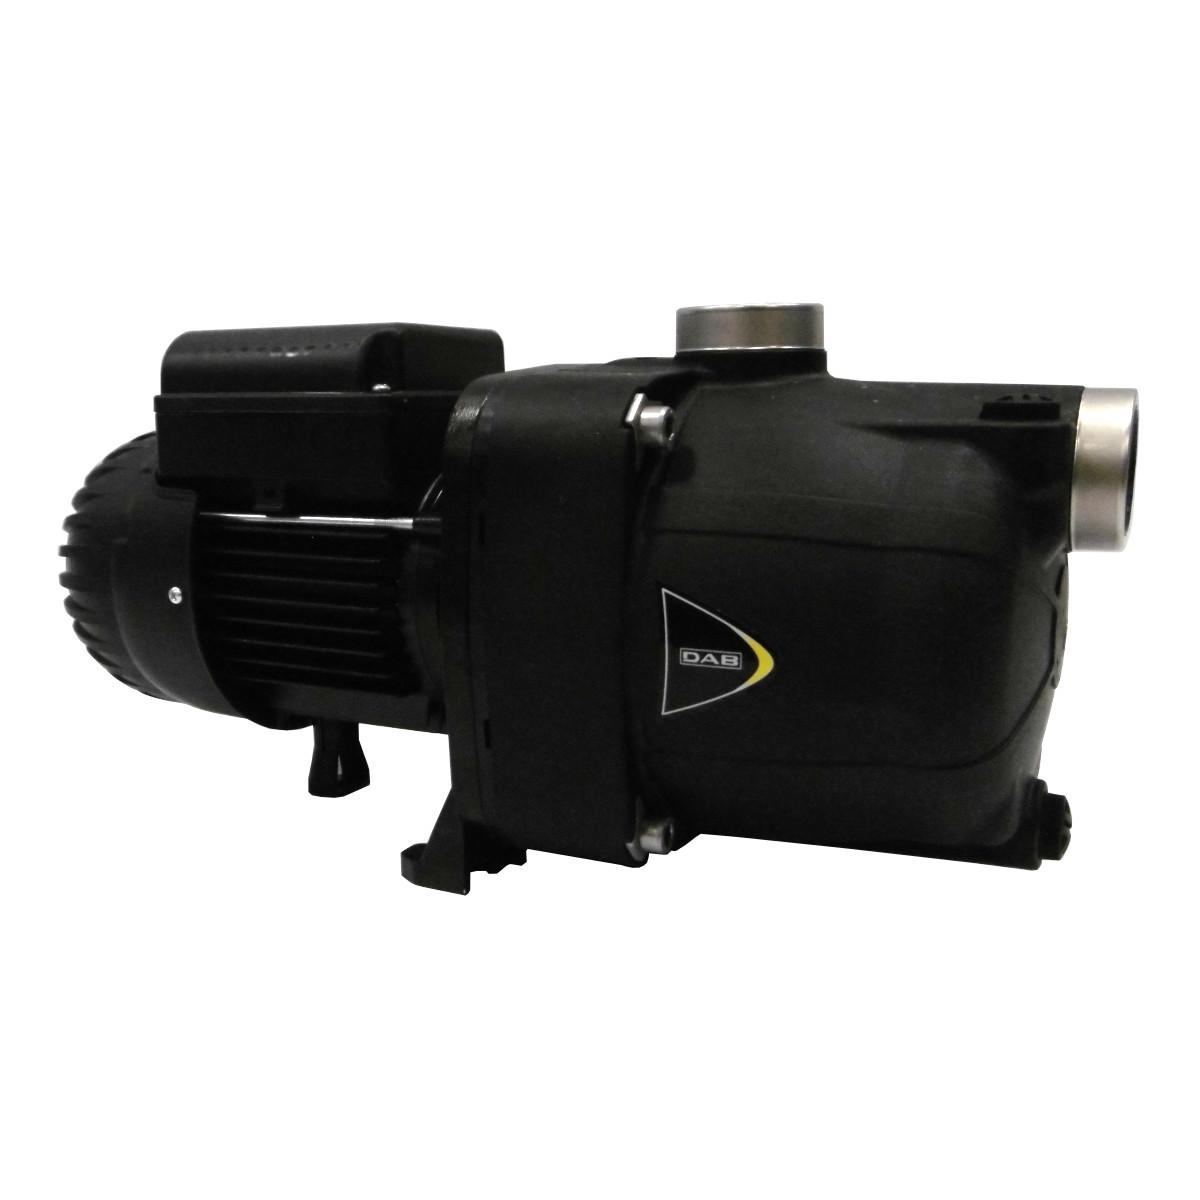 Surpresseur Eurocom 3M 3/4 CV 0,88 kW | DAB